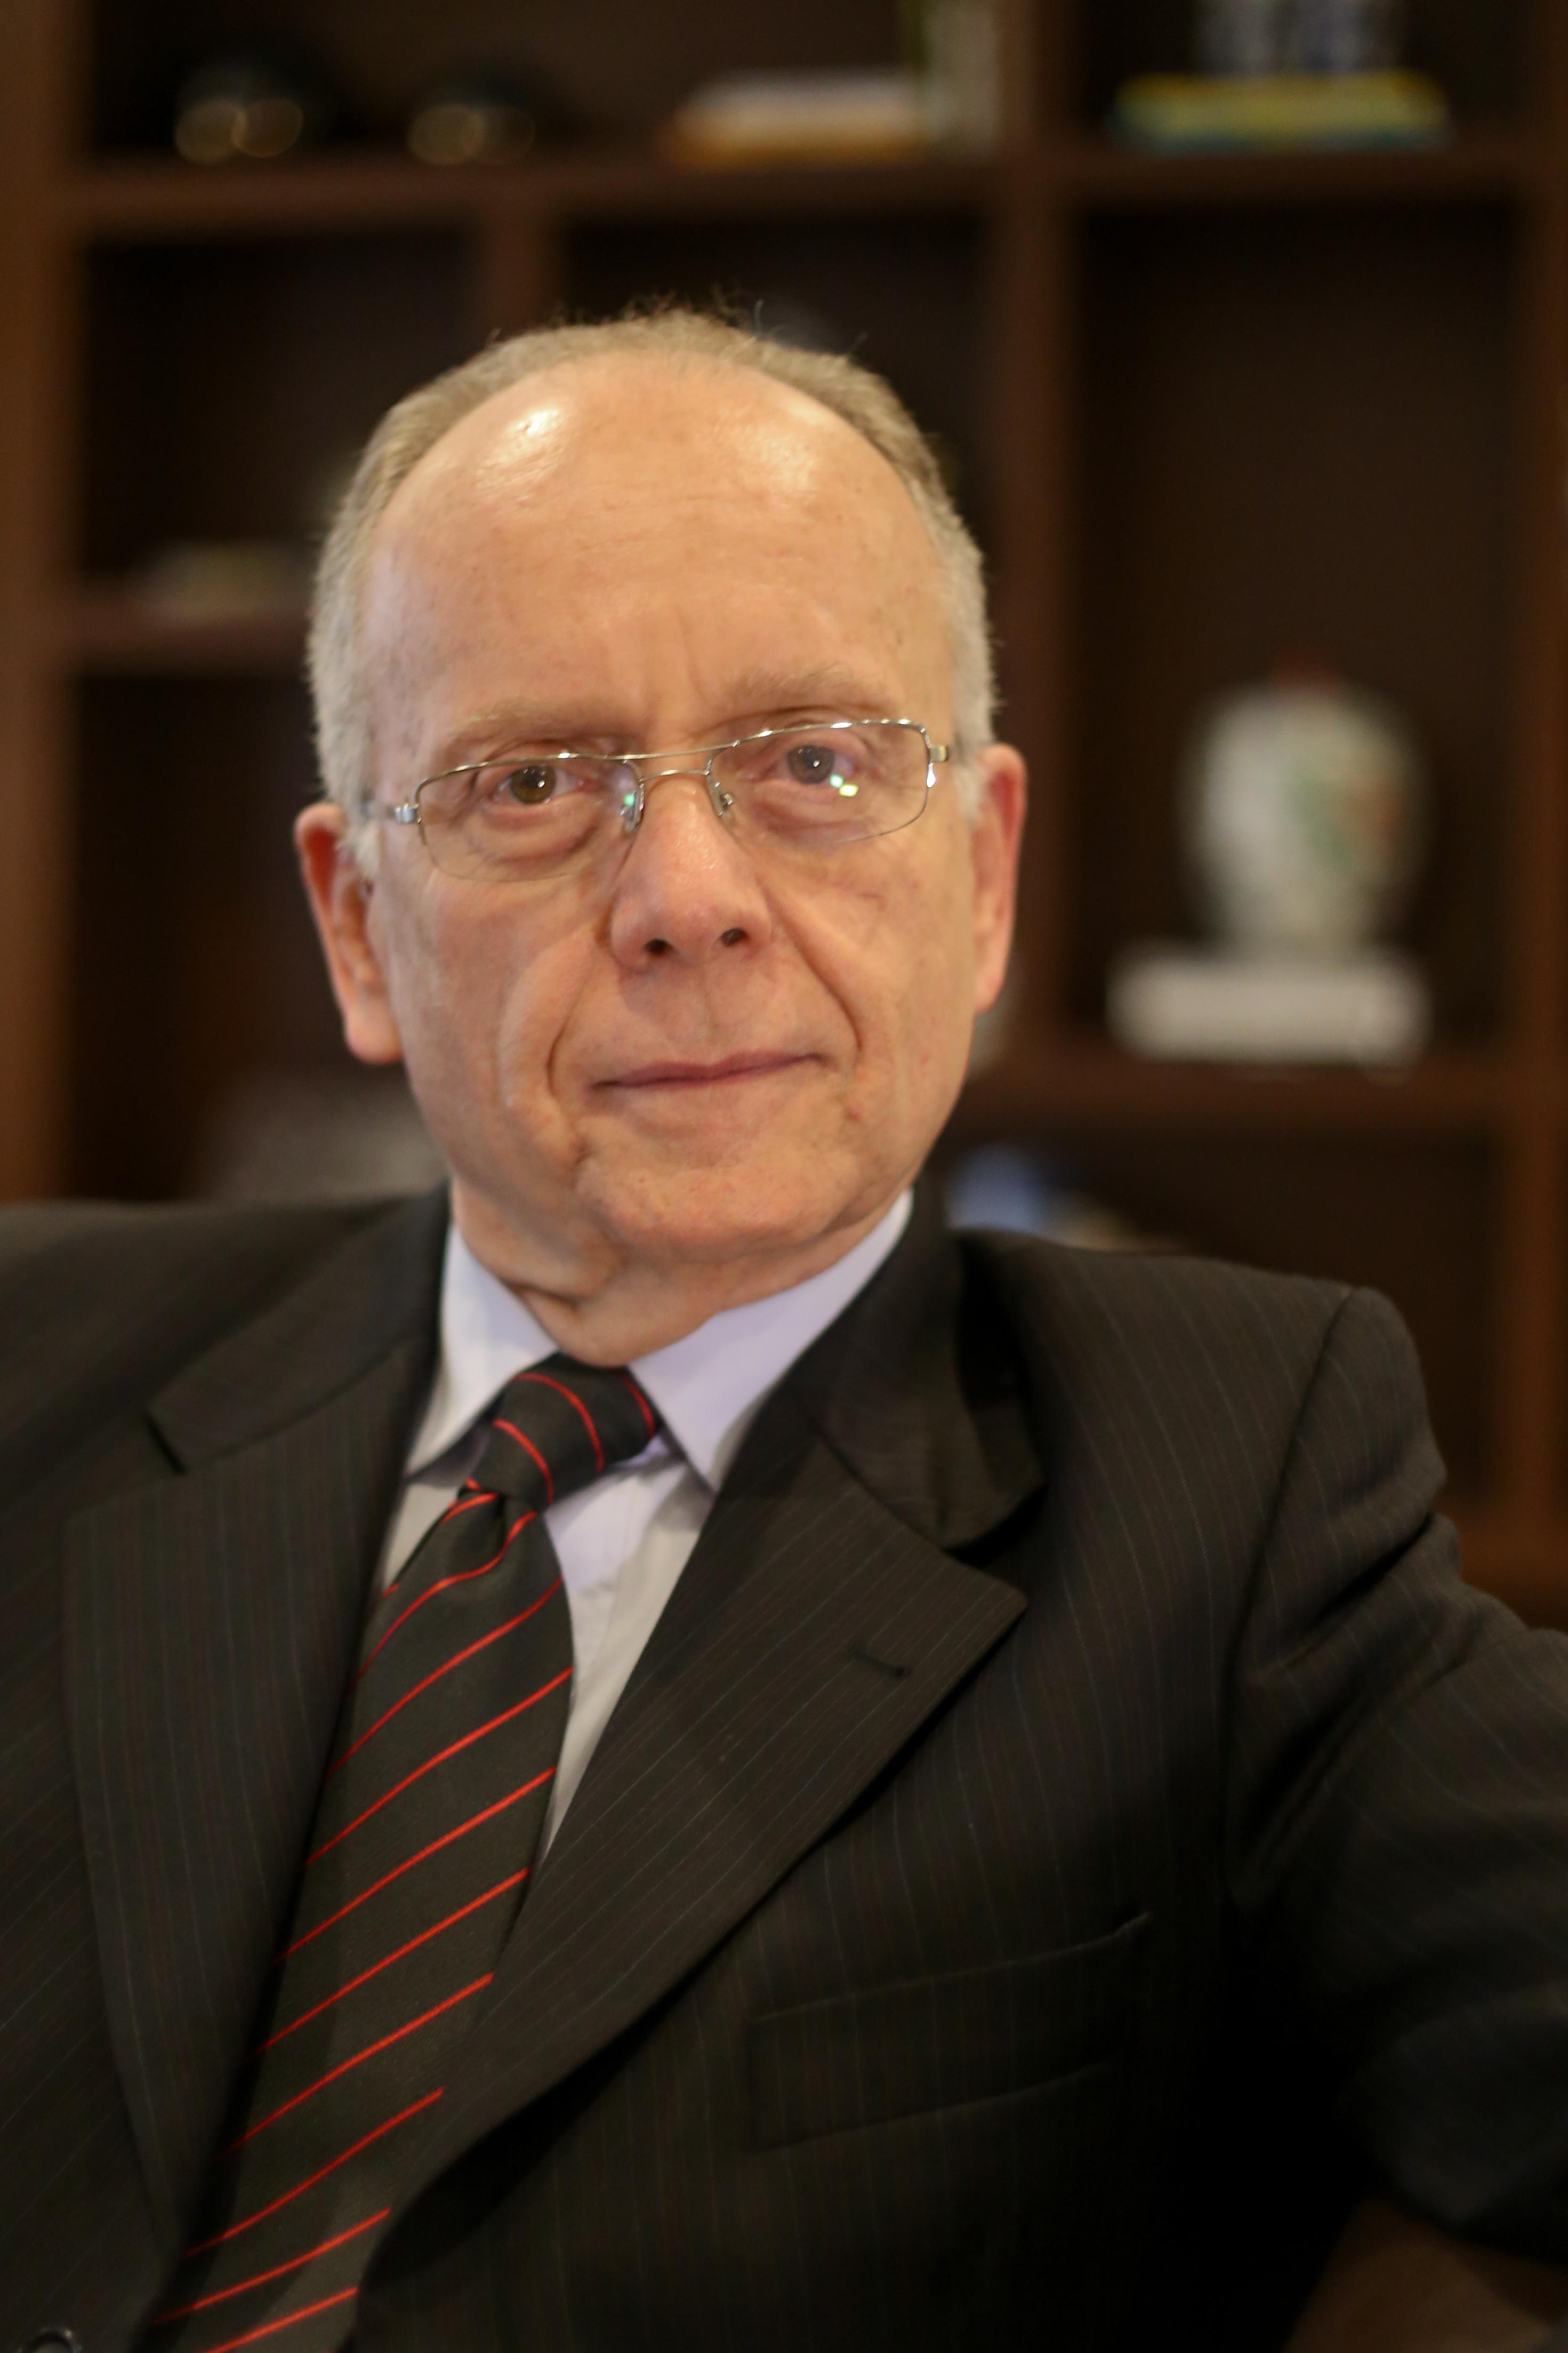 Dr. Paulo Roberto Grimaldi Oliveira